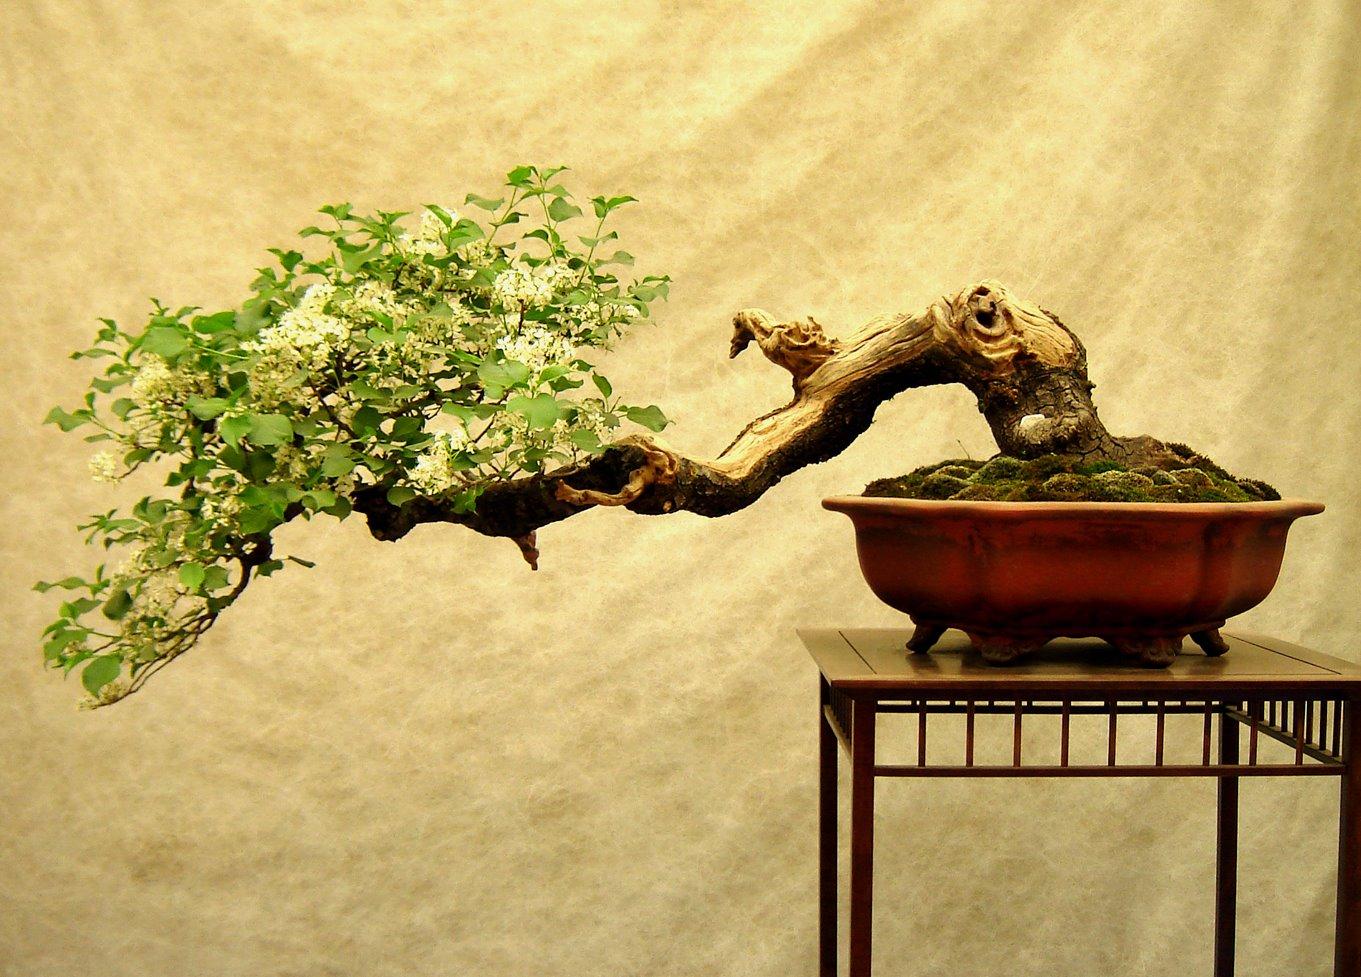 http://3.bp.blogspot.com/-SDA6IW-RlhQ/T4ur5zJfruI/AAAAAAAAC9M/4ly4s56QTr8/s1600/bonsai.jpg